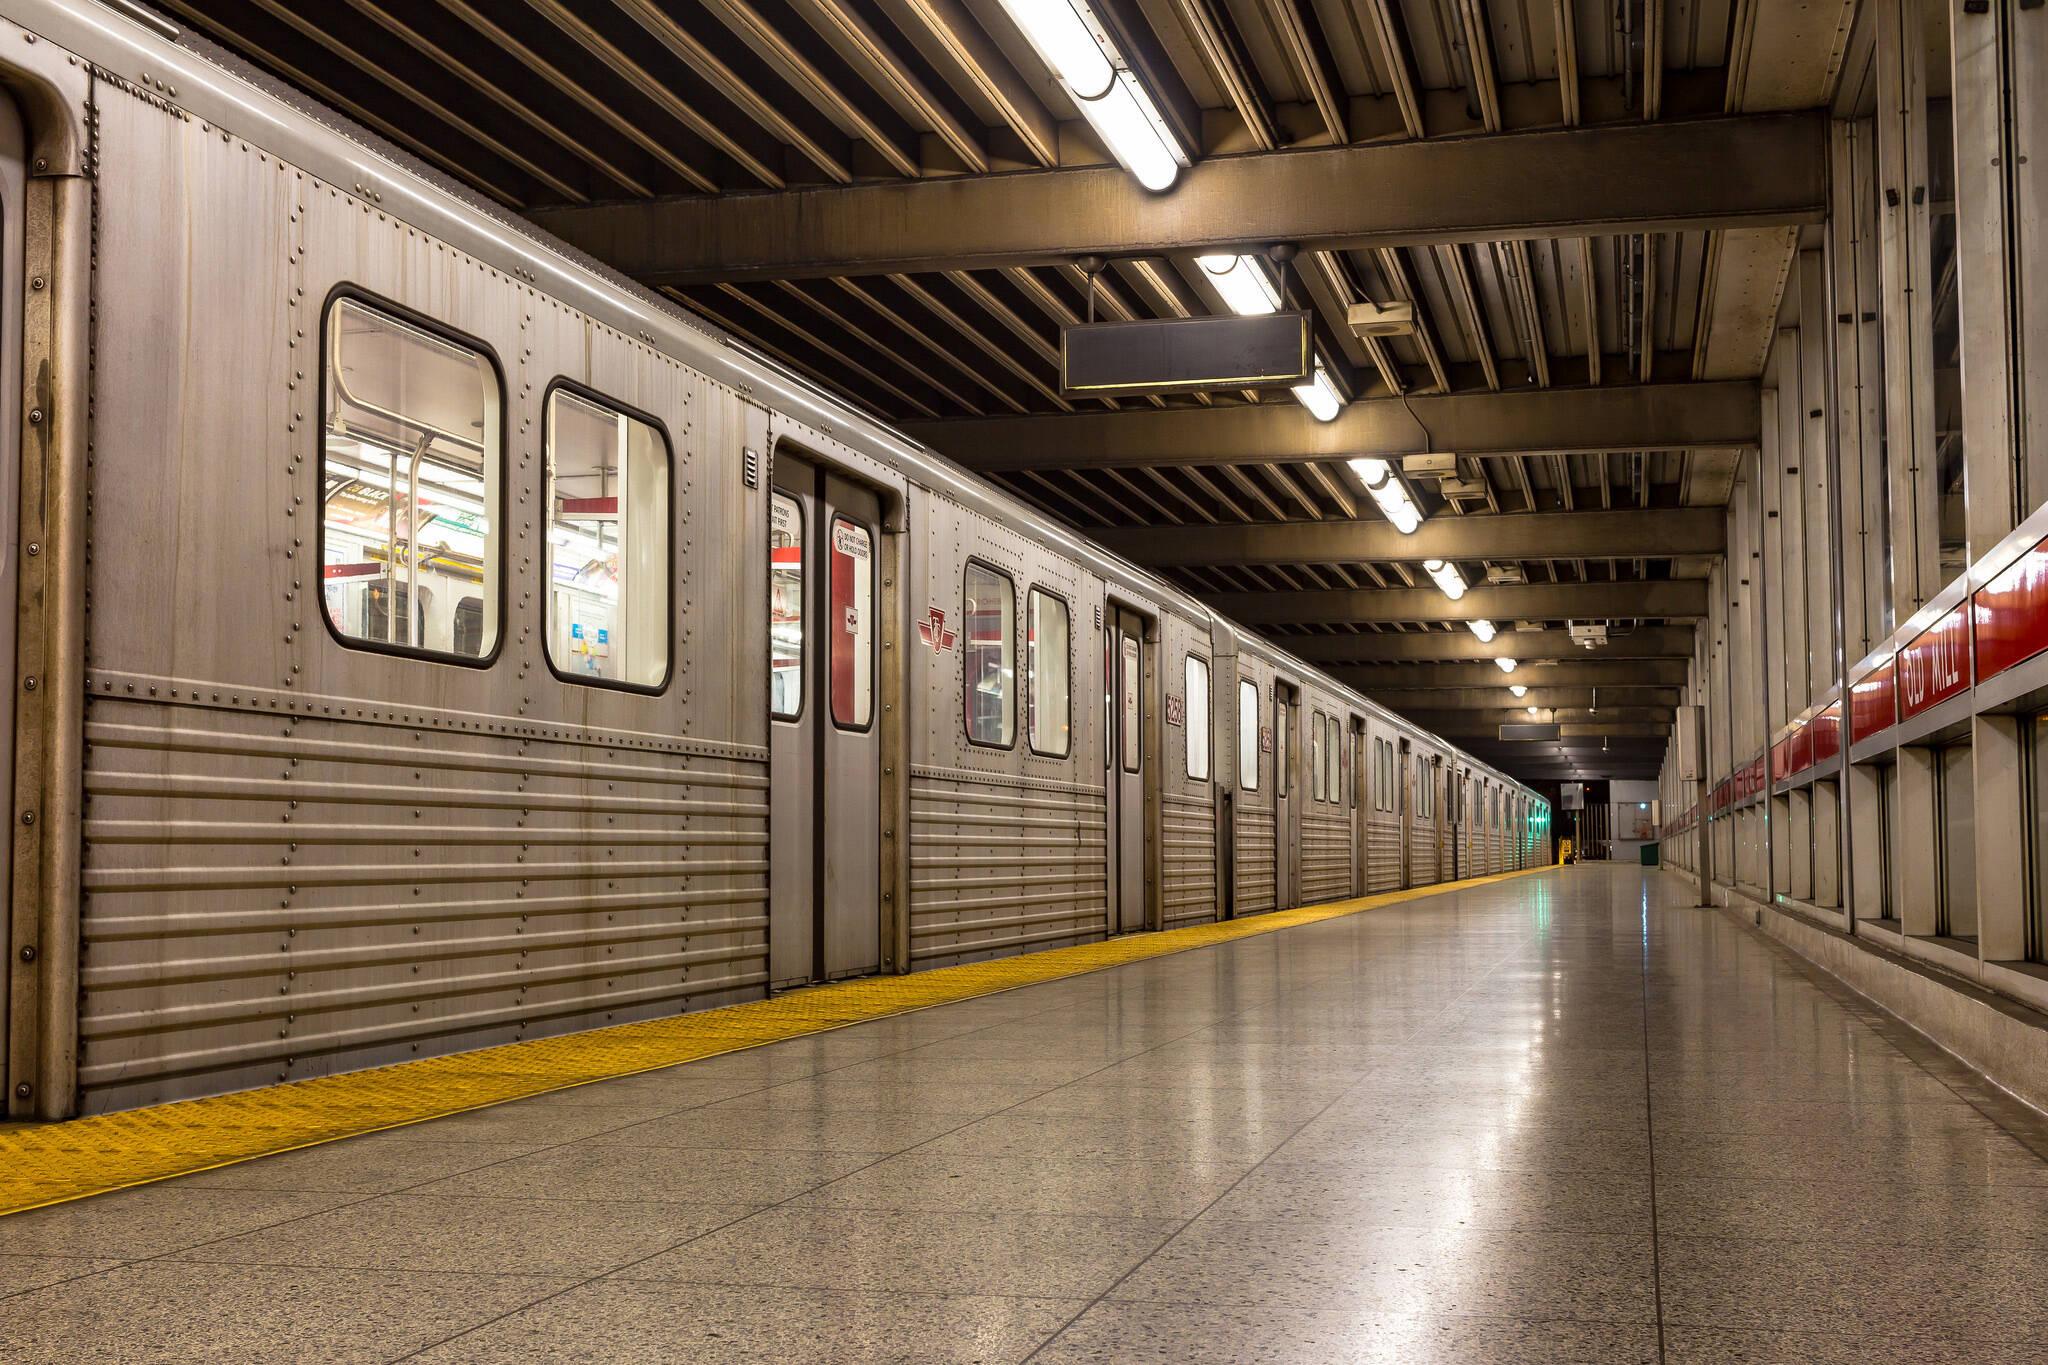 ttc hot subway cars